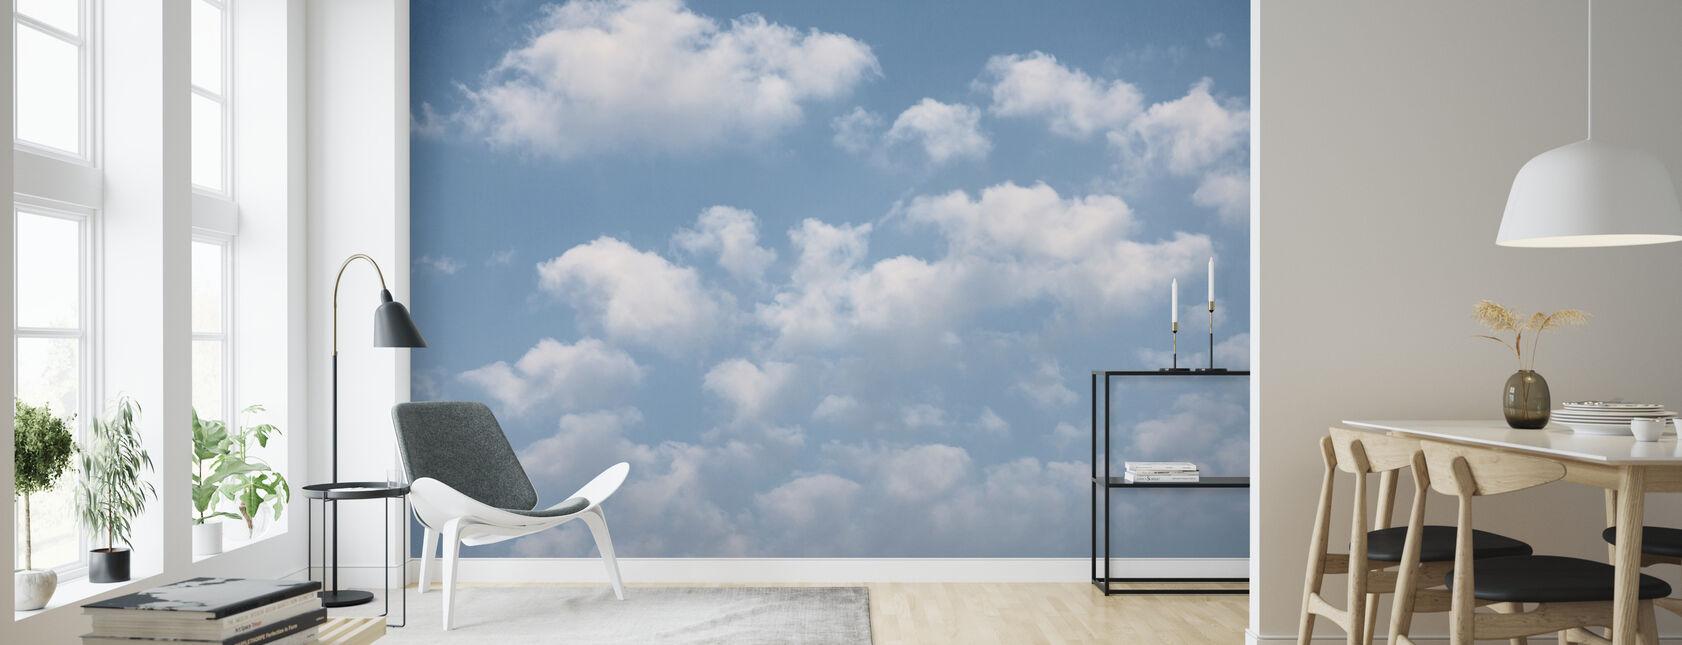 Cloud Sky - Wallpaper - Living Room